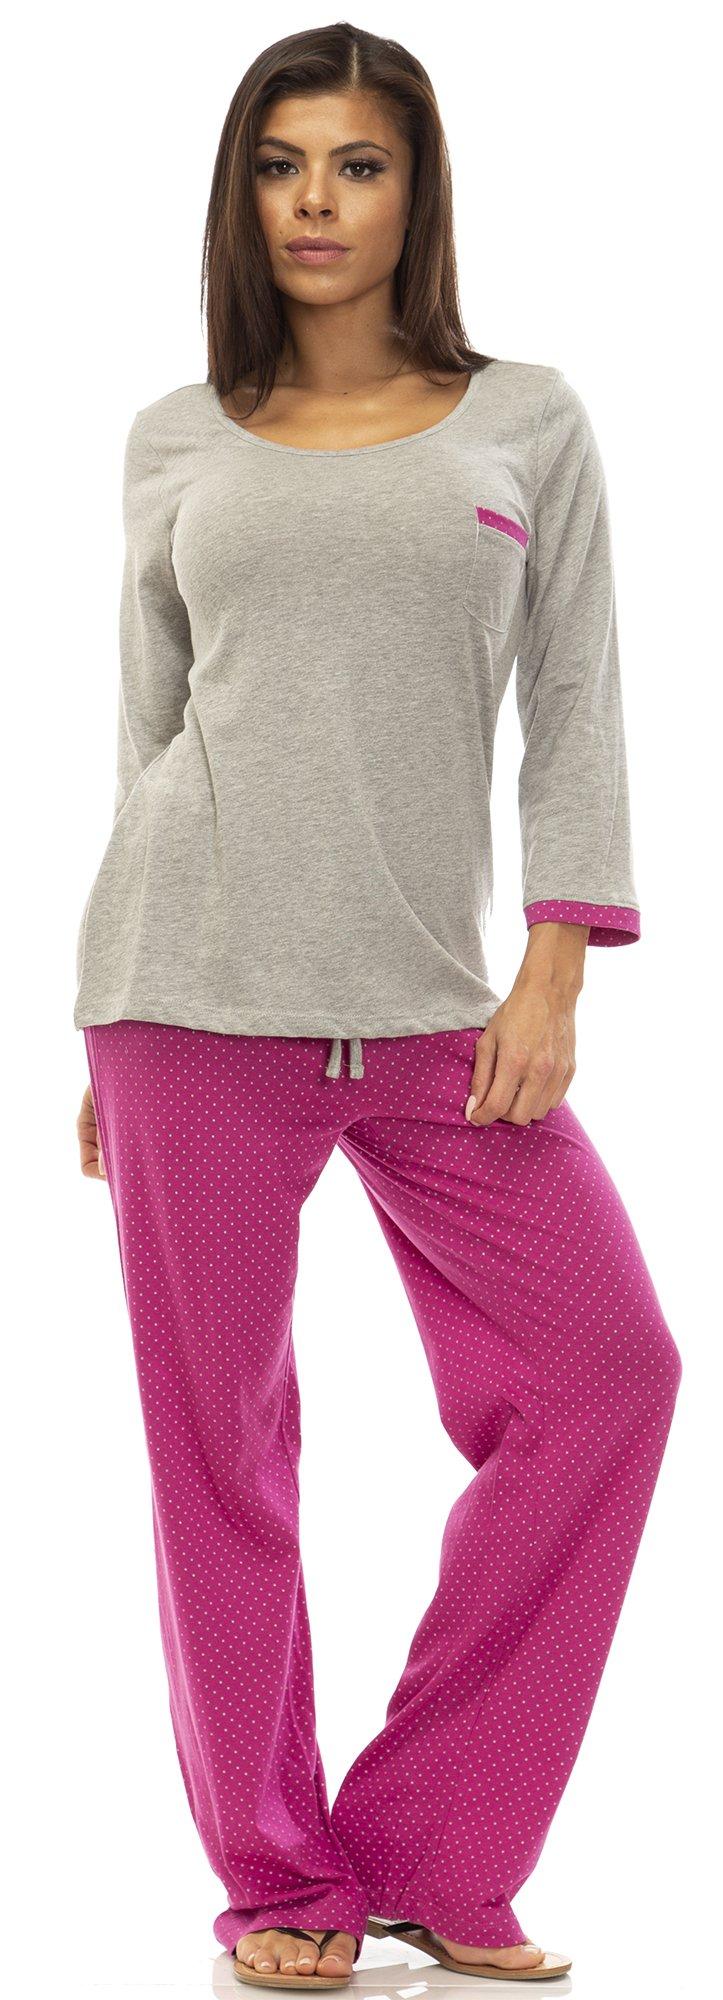 IZOD (6455AZ) Womens Womens 100% Cotton High Low Tee Pajama Lounge Set Size: Medium in Grey (020)